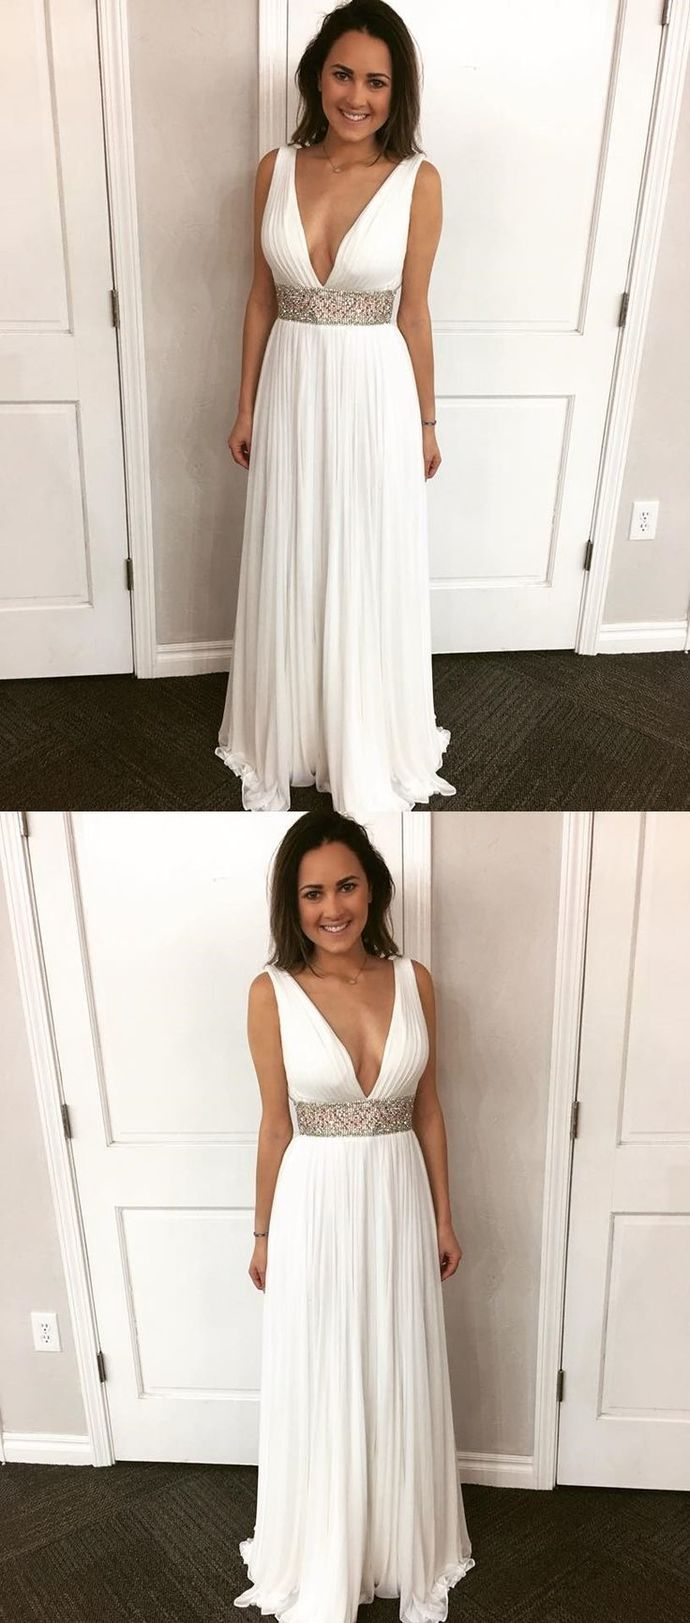 V Neck Ivory Chiffon Prom Dress with Bling Belt,White Prom Dress with Slit,2018